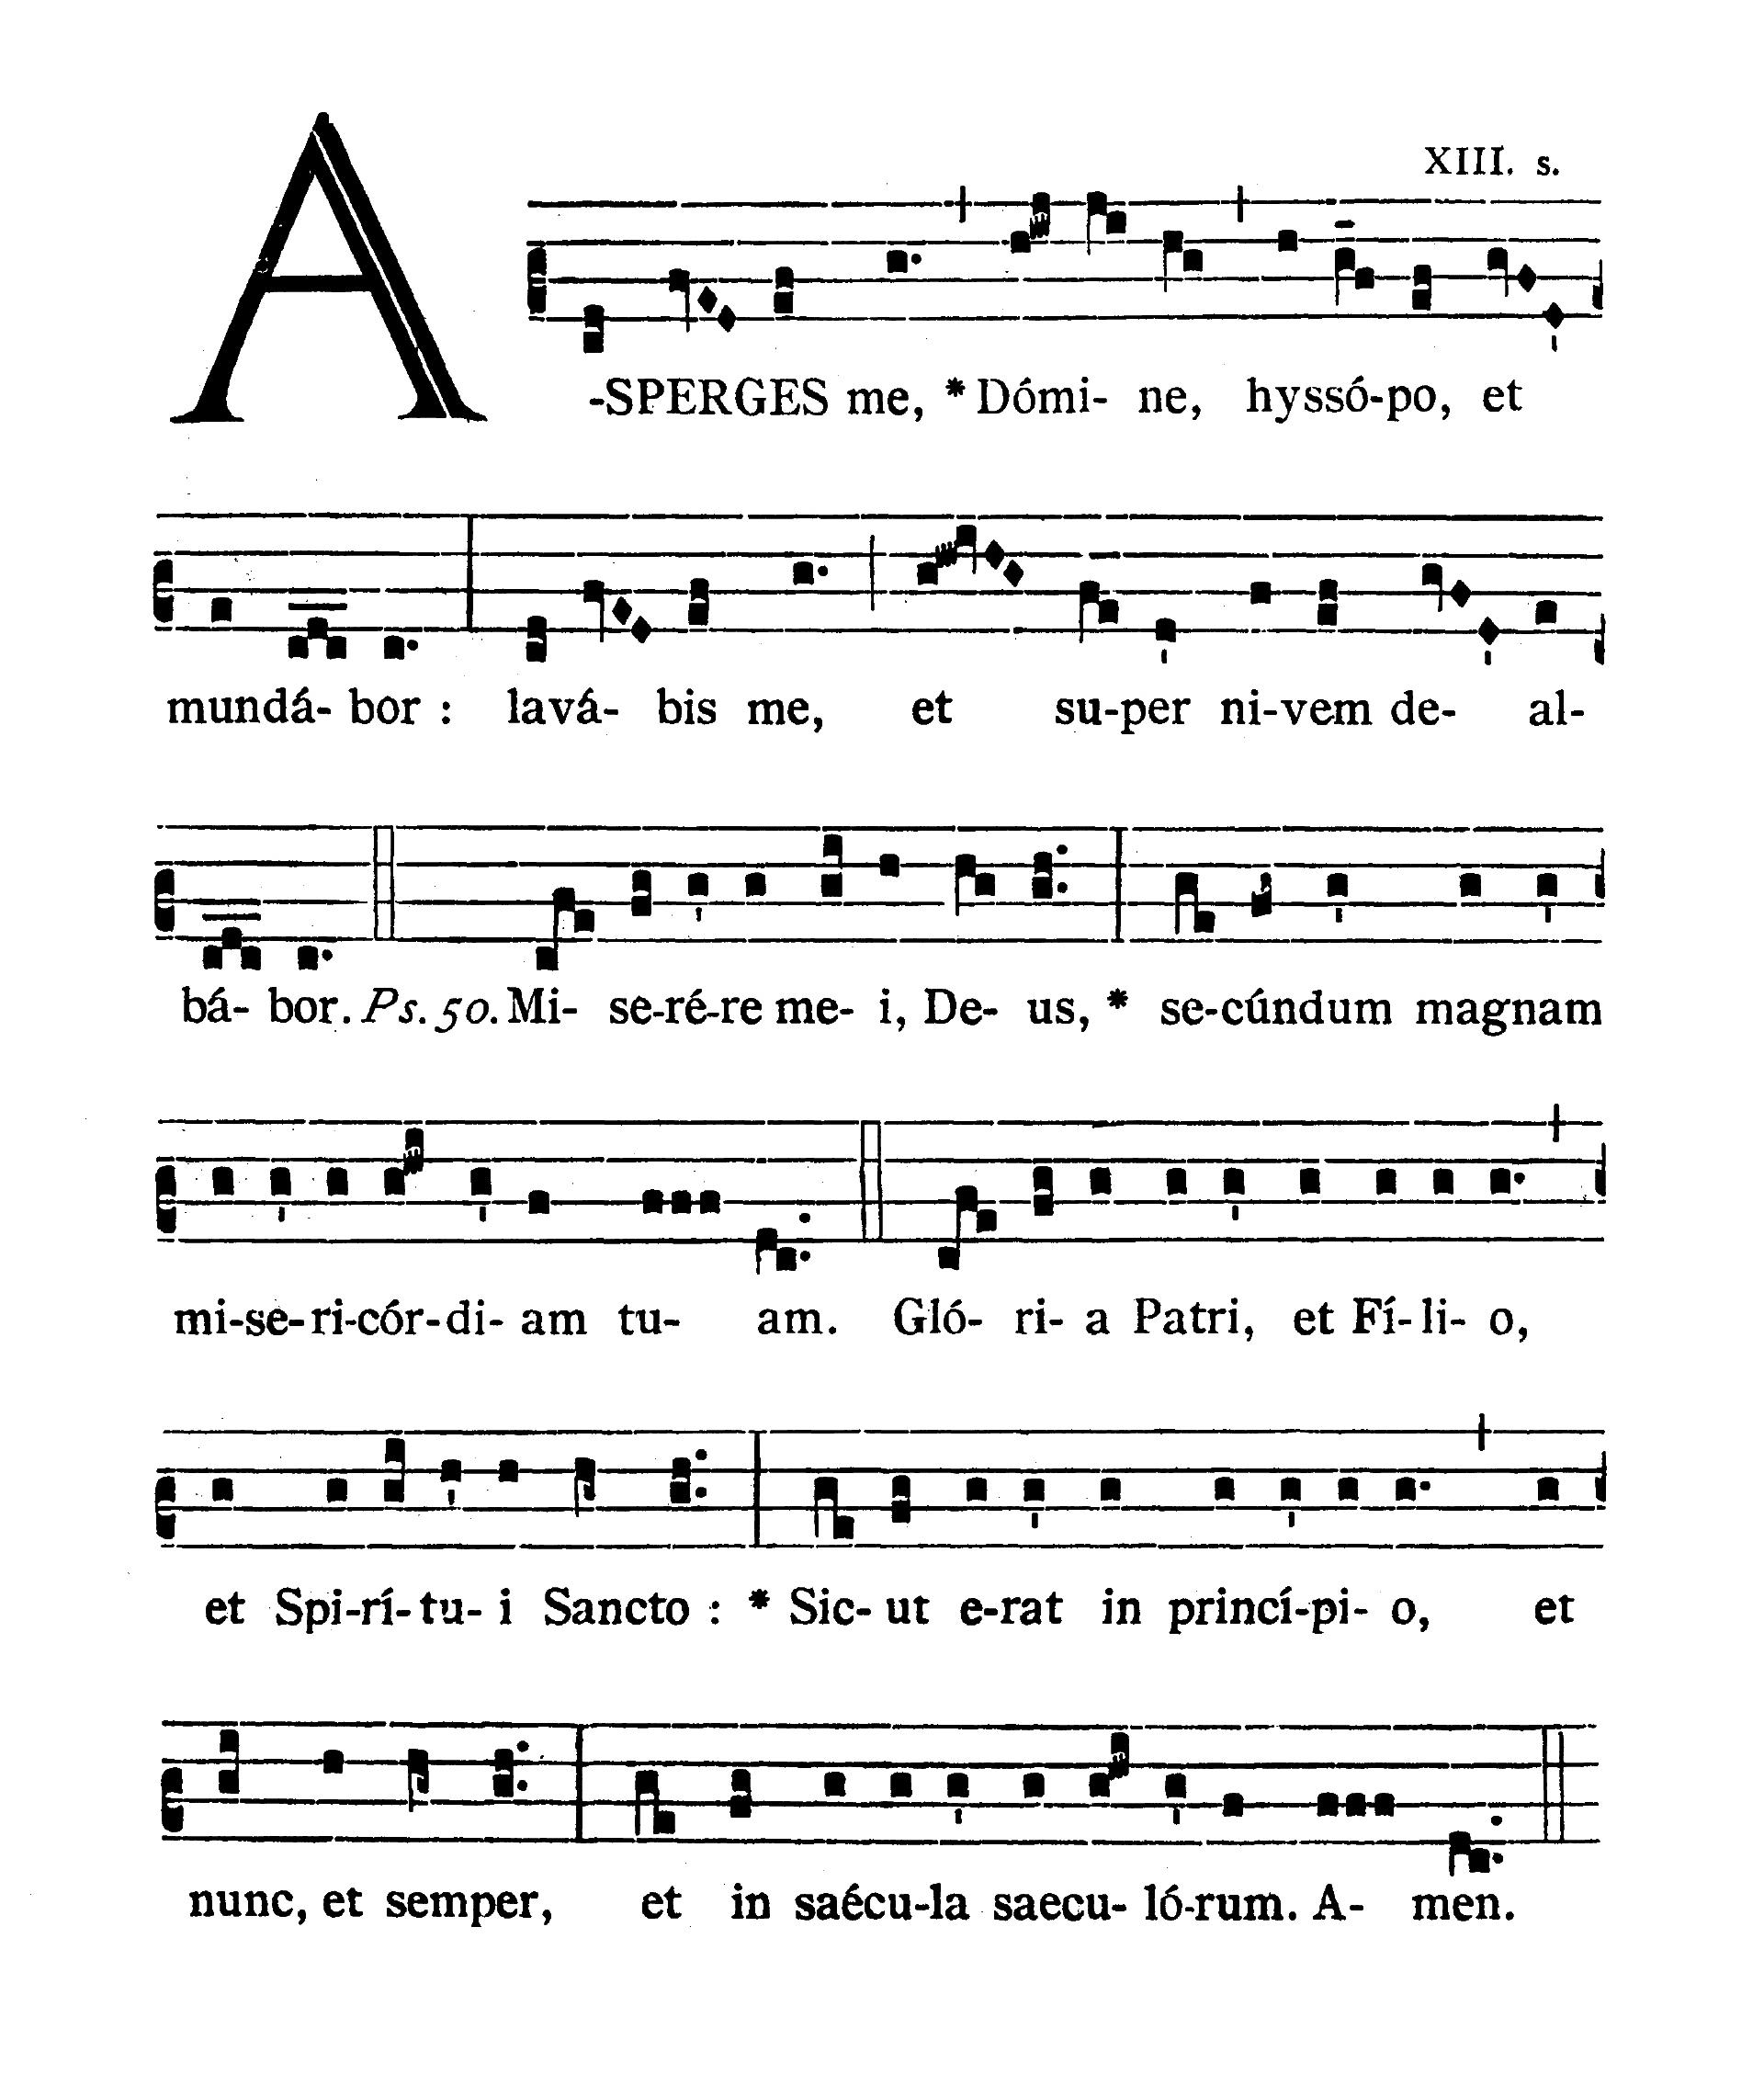 Asperges me - notation